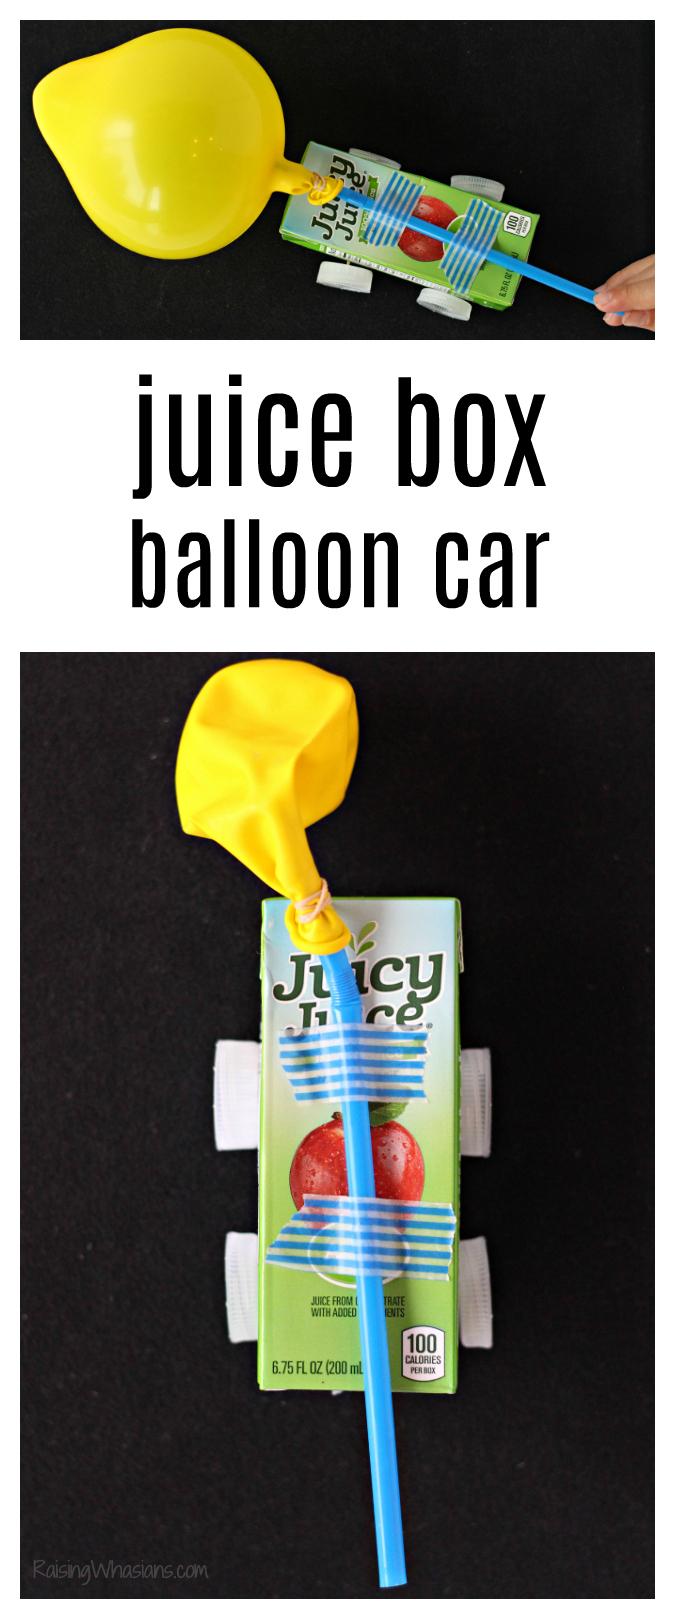 Juice box balloon car craft